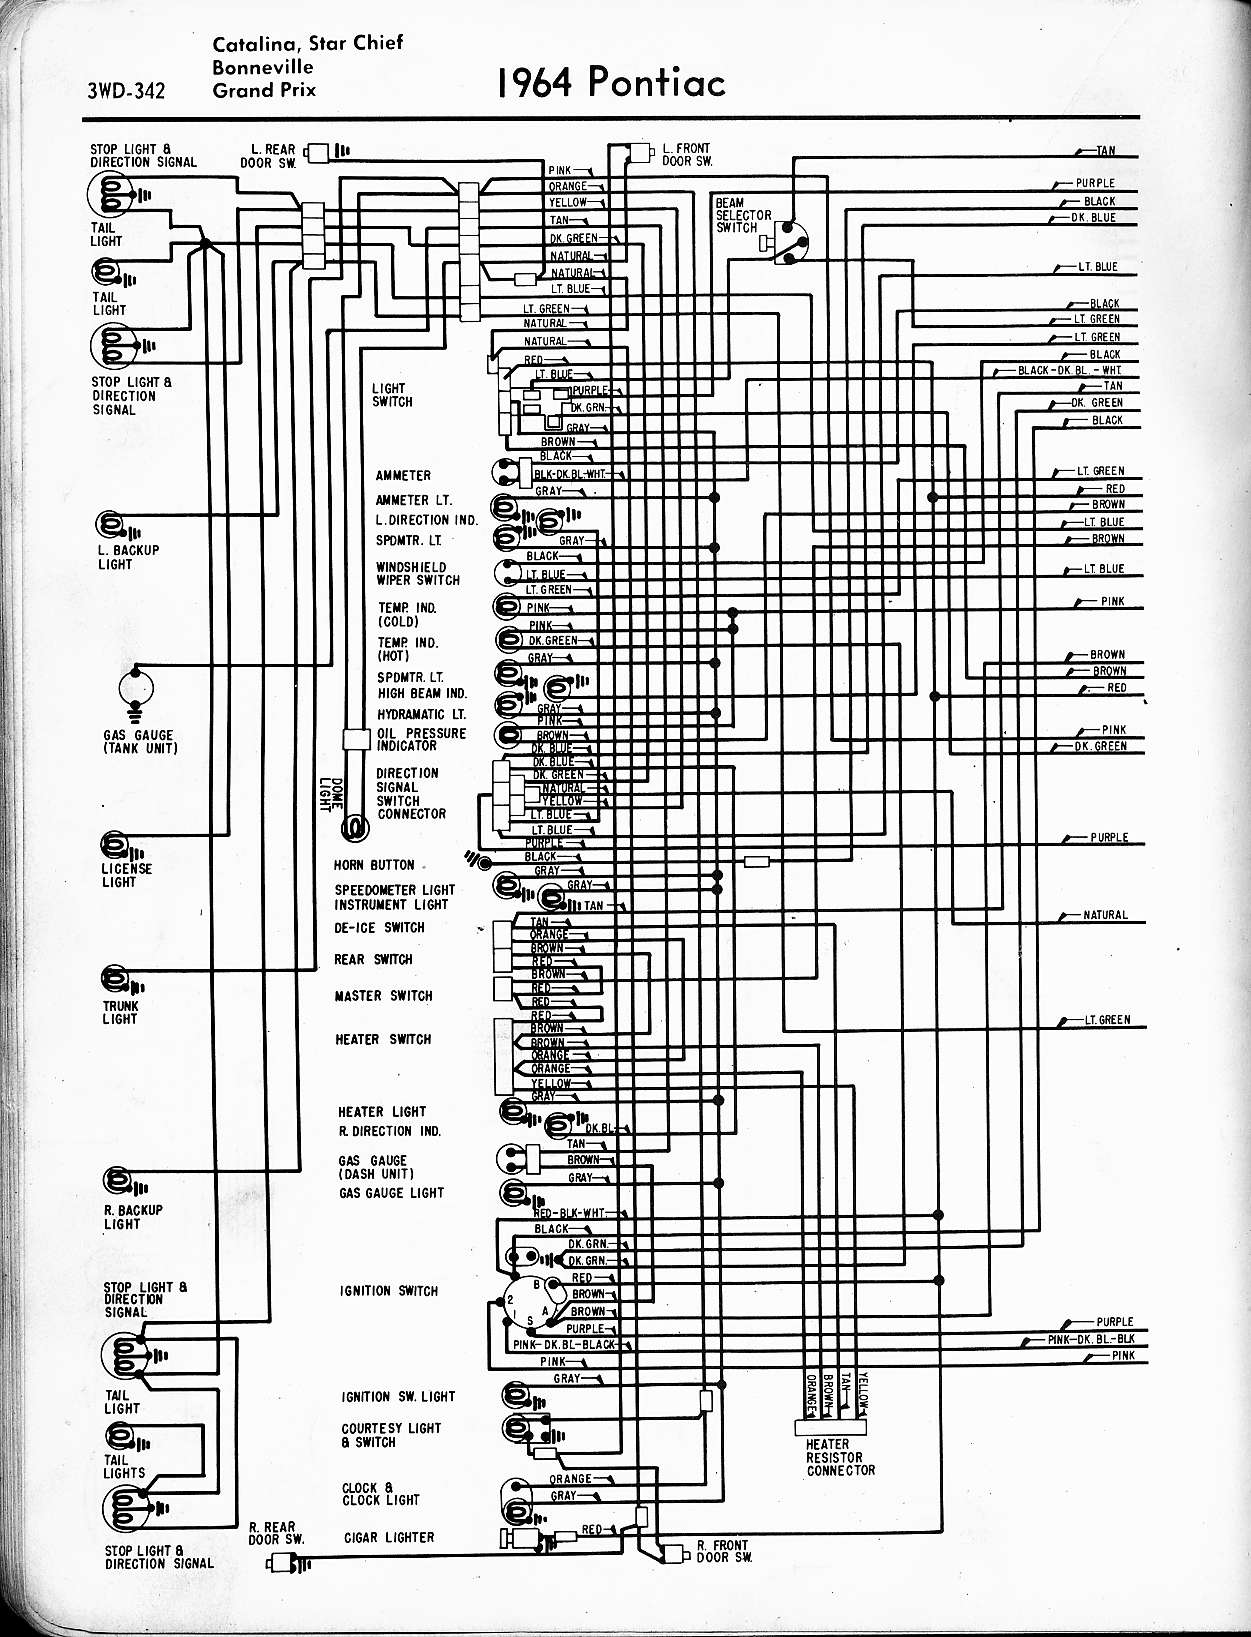 2004 pontiac grand prix dash wiring diagram sony cdx gt25mpw ignition switch diagrams great 1957 1965 rh oldcarmanualproject com 2008 2002